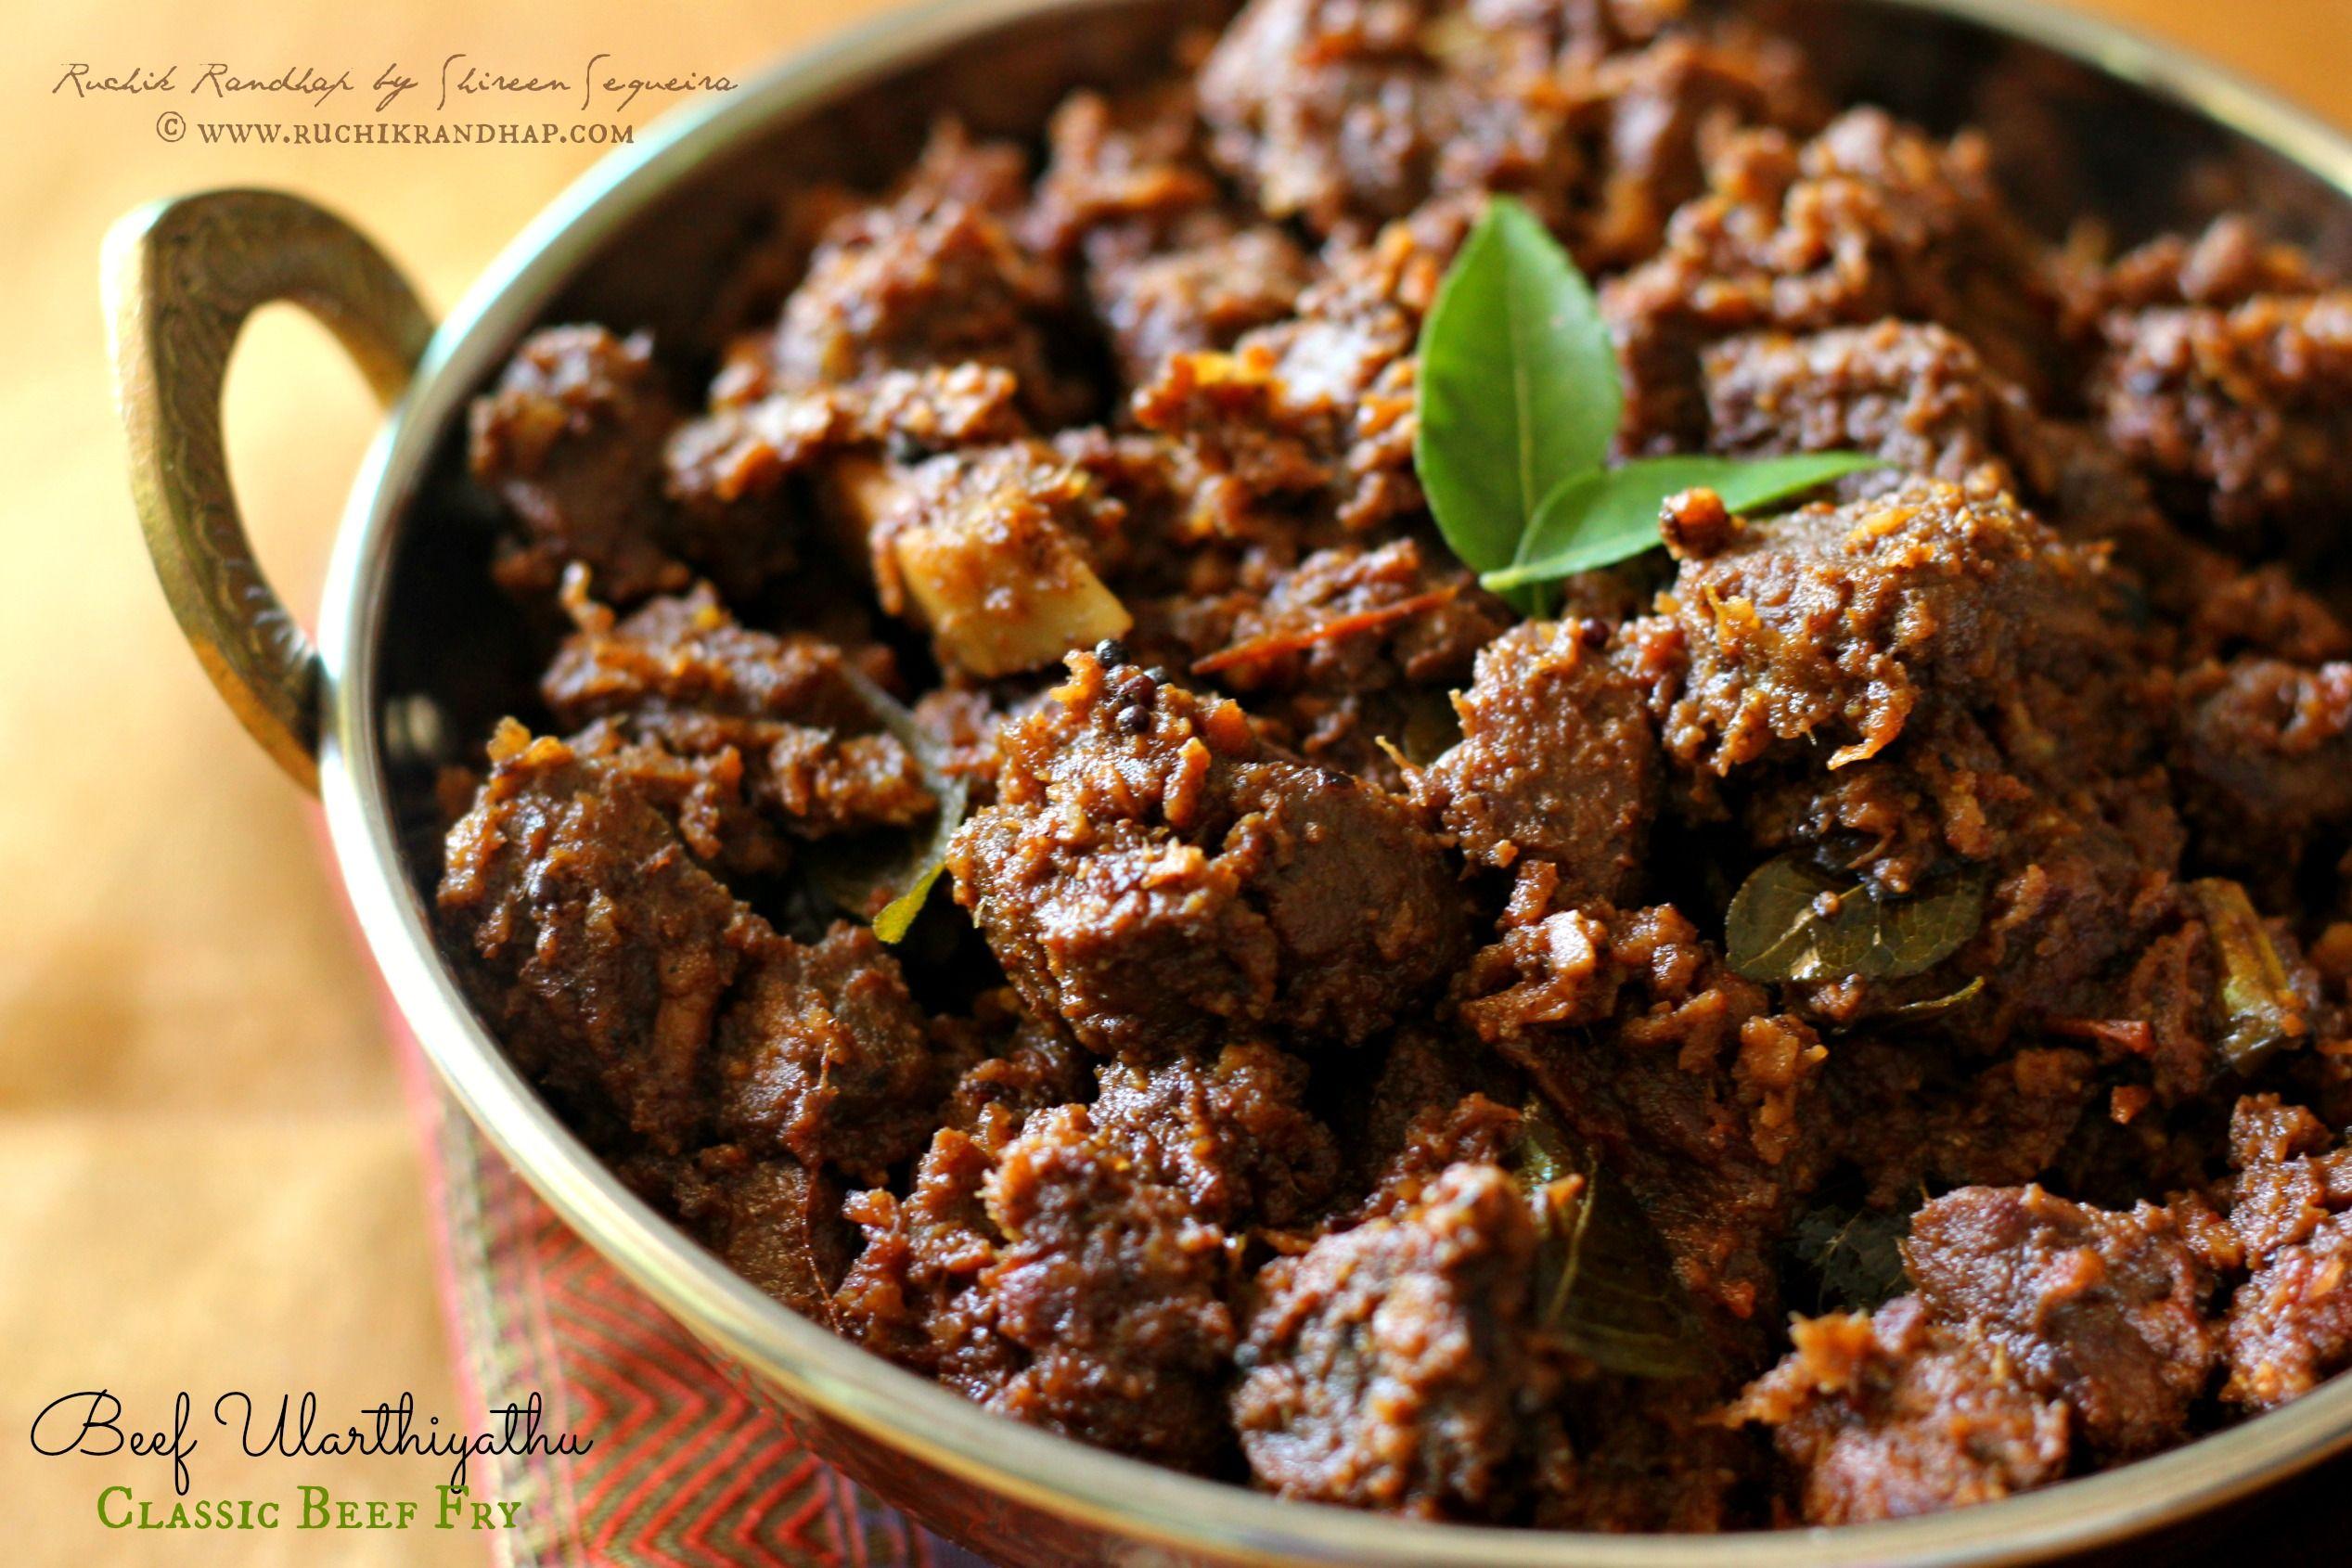 Beef Ularthiyathu Classic Kerala Style Beef Fry Ruchik Randhap Indian Beef Recipes Indian Food Recipes Beef Recipes